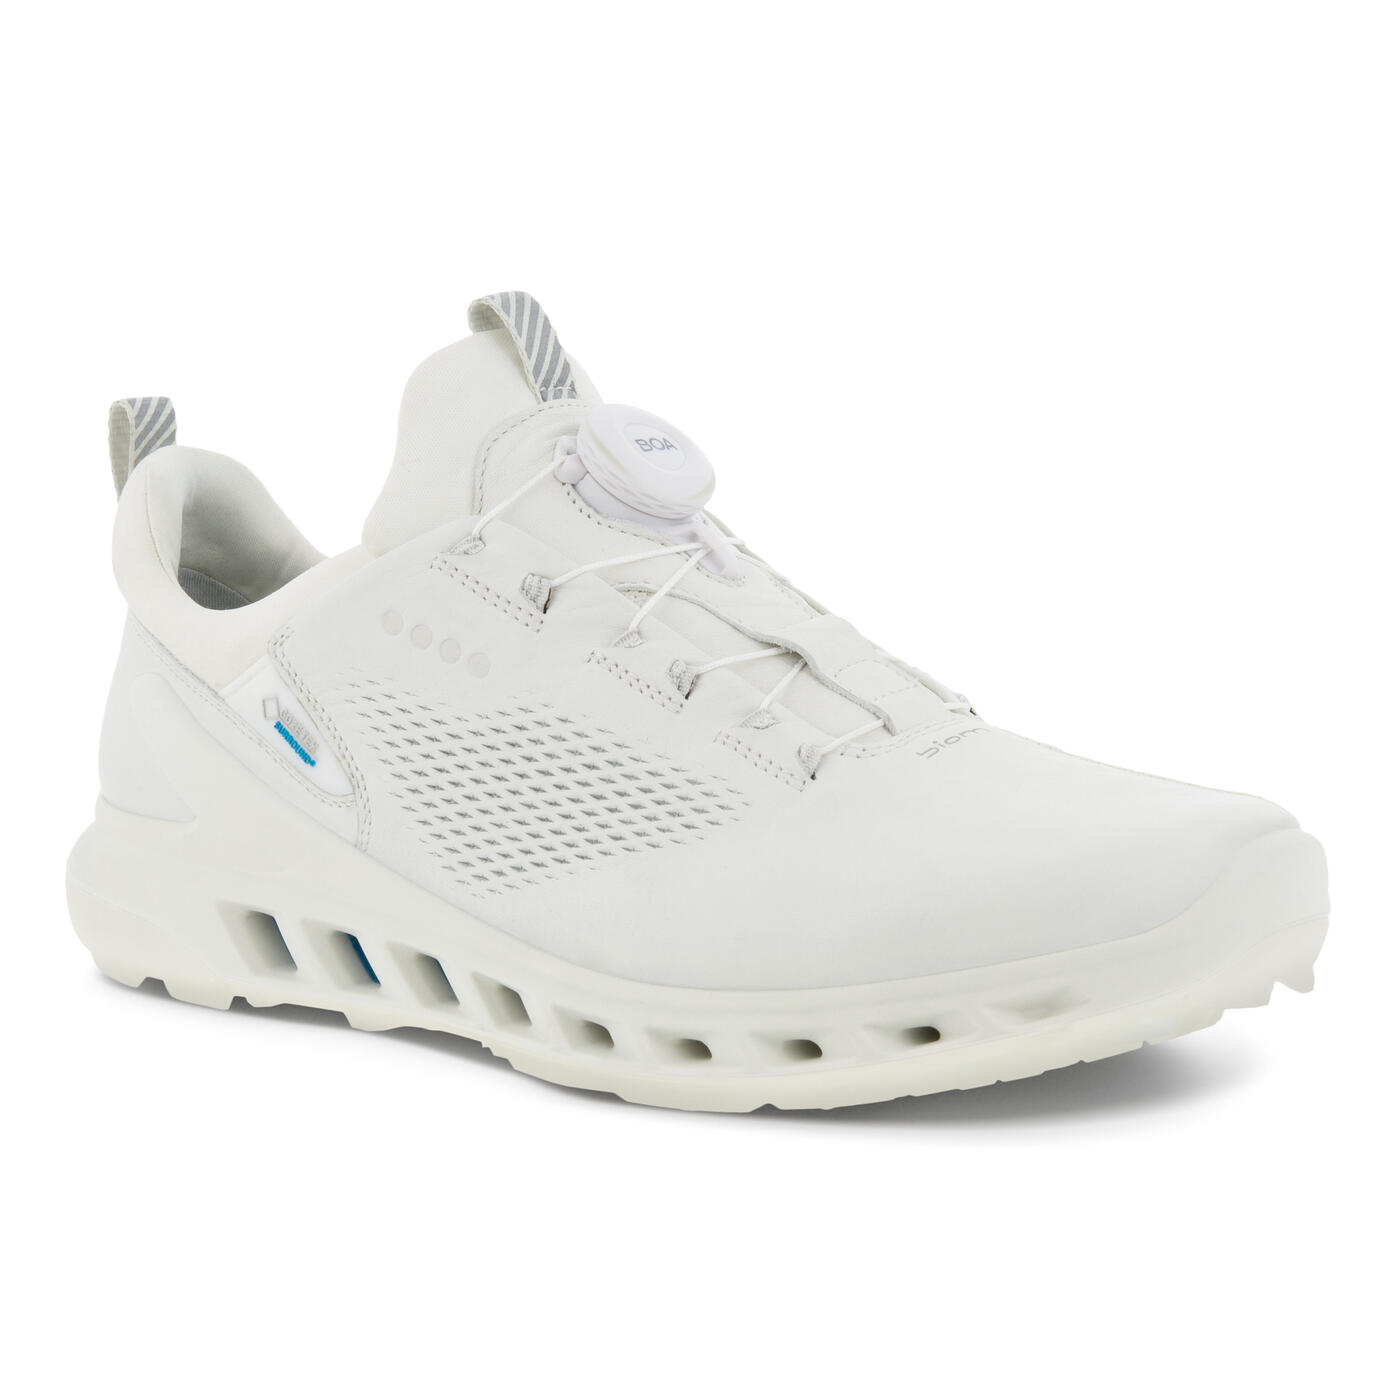 ECCO Men's Biom Cool Pro BOA Golf Shoe